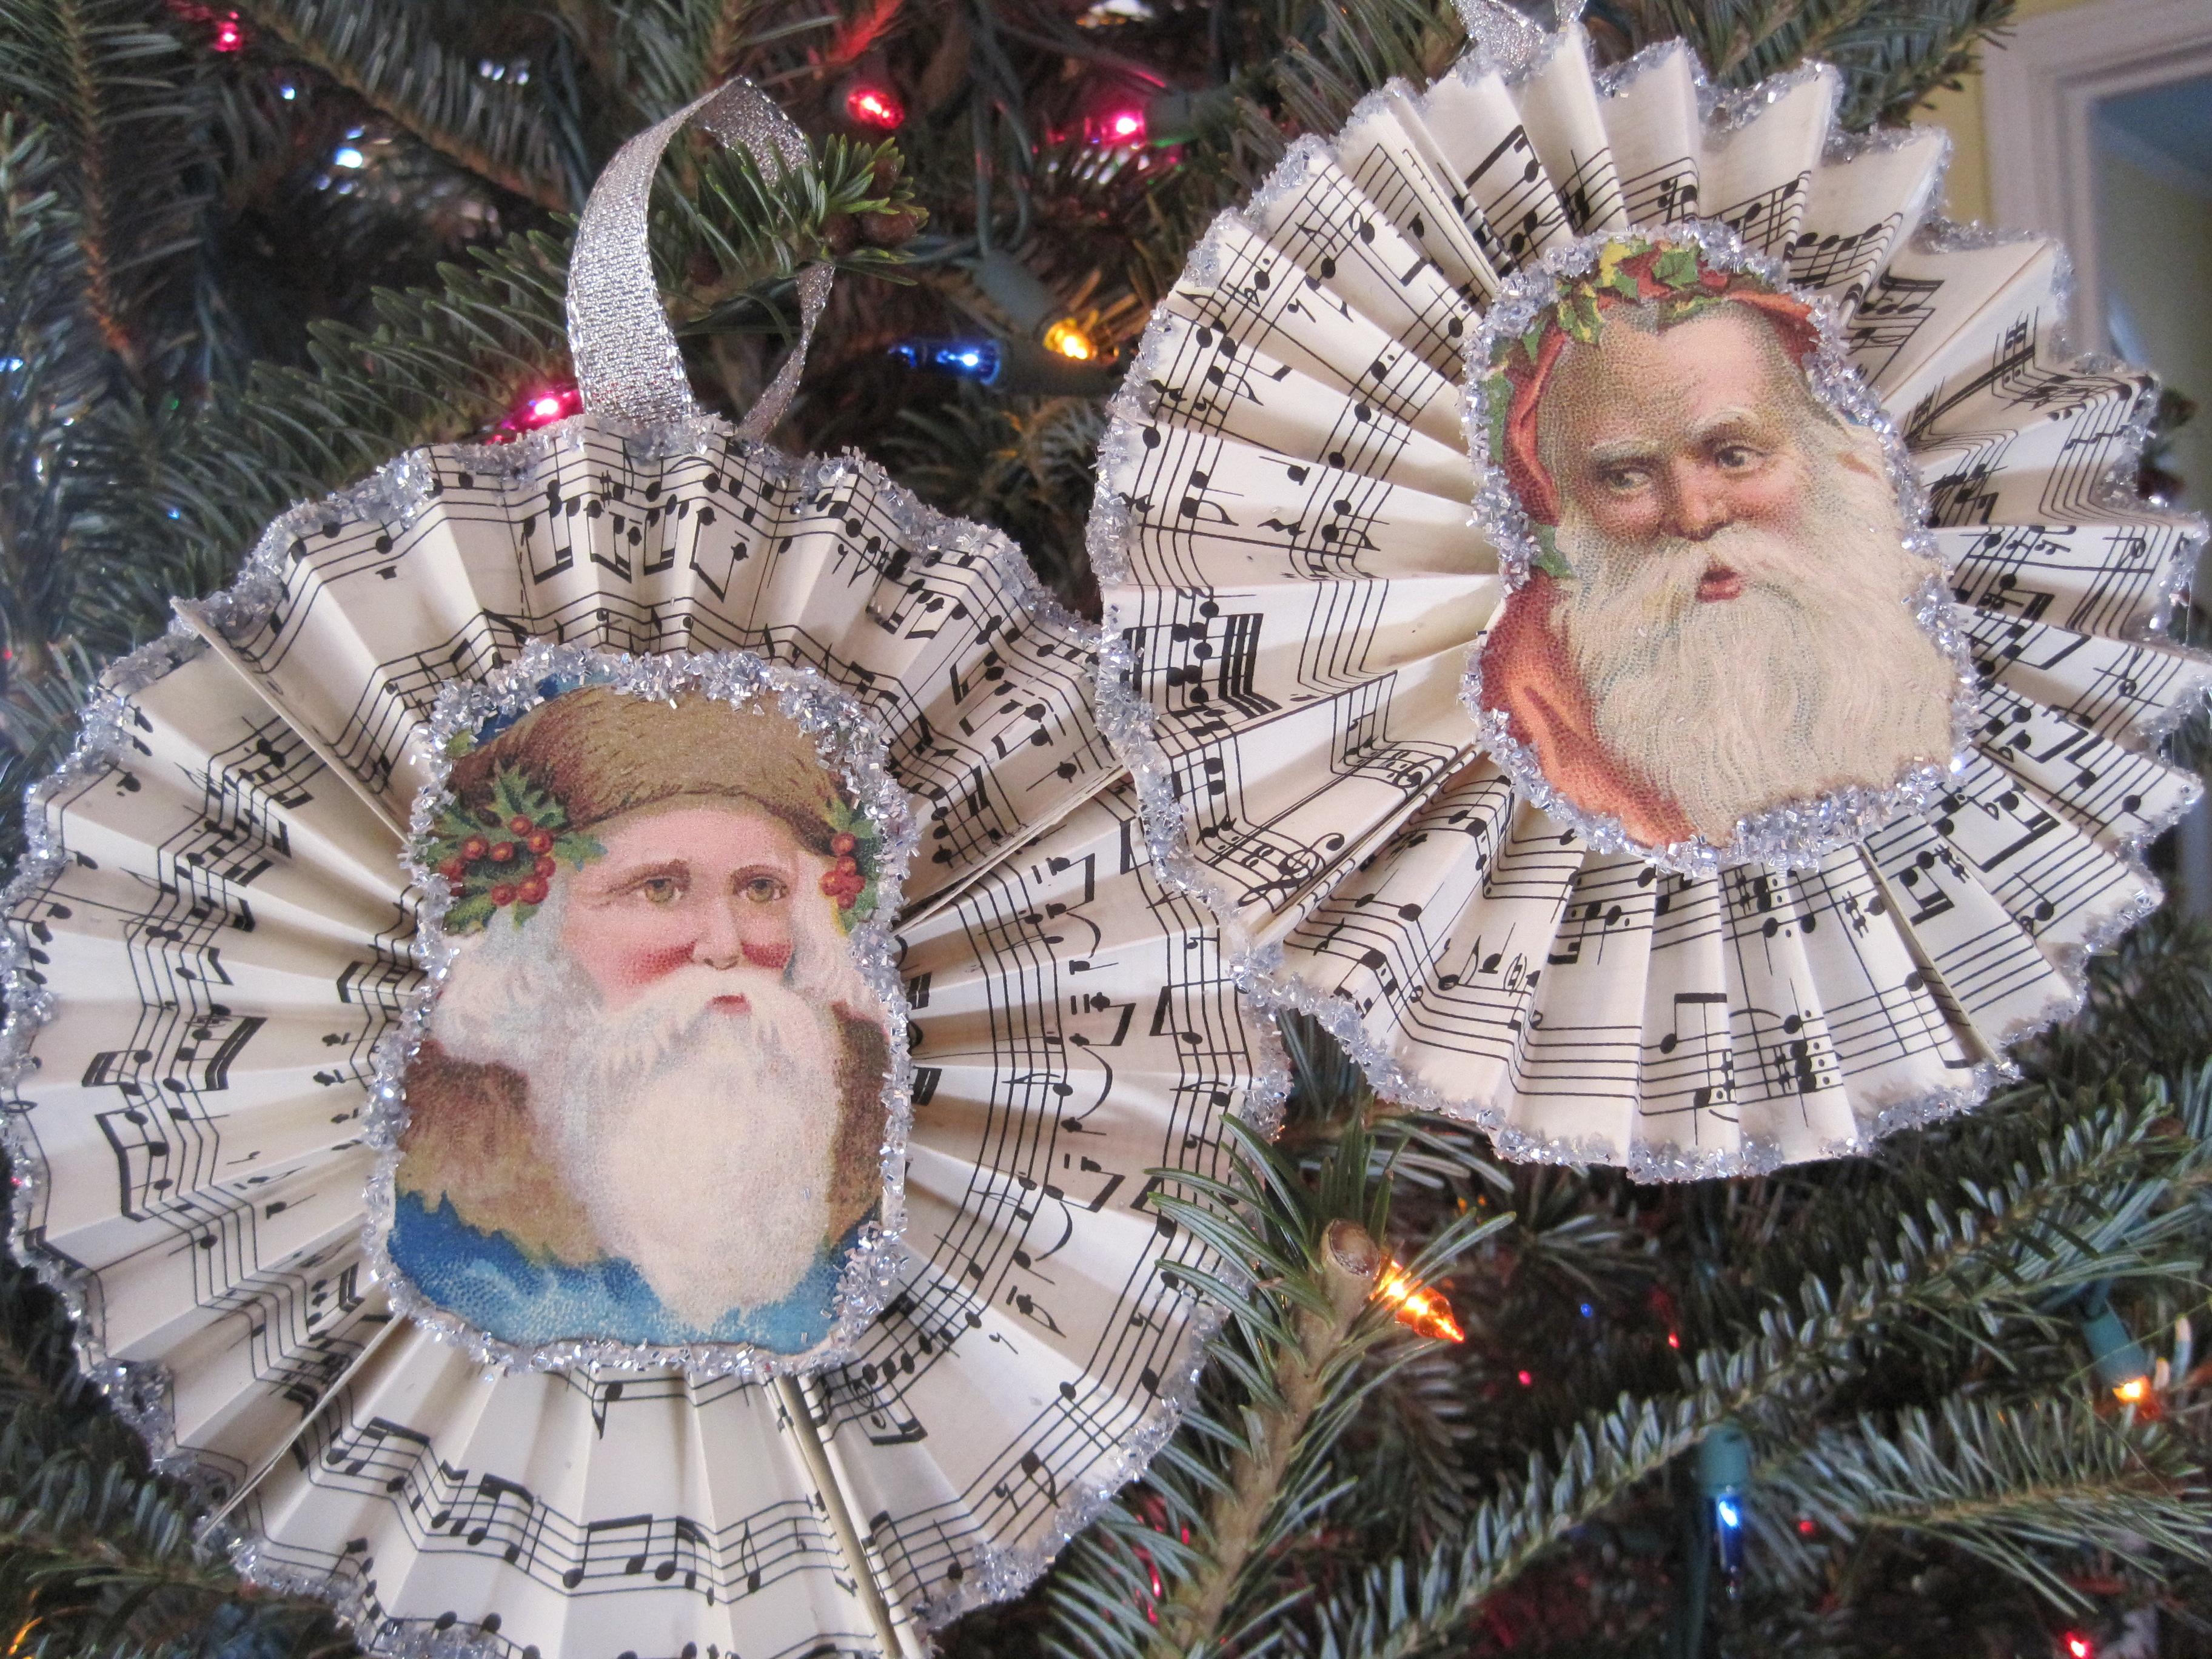 Sheet music christmas ornaments - Img_4675